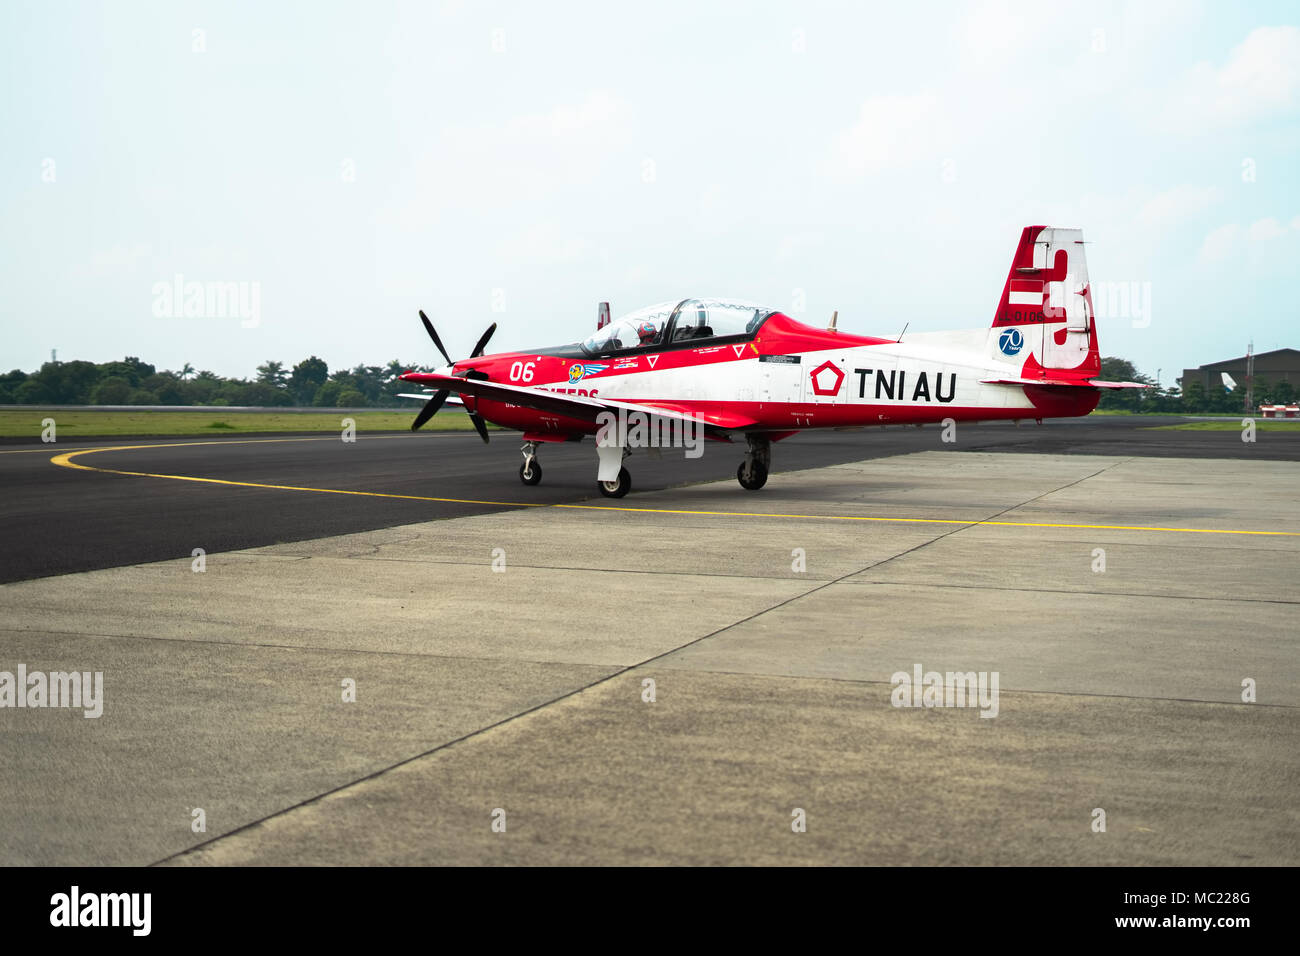 Jupiter  Aircraft Leaving Hangar Taxiway Before Take Off During Indonesia Air Force Ceremonial, Halim Perdana Kusuma Airport Stock Photo